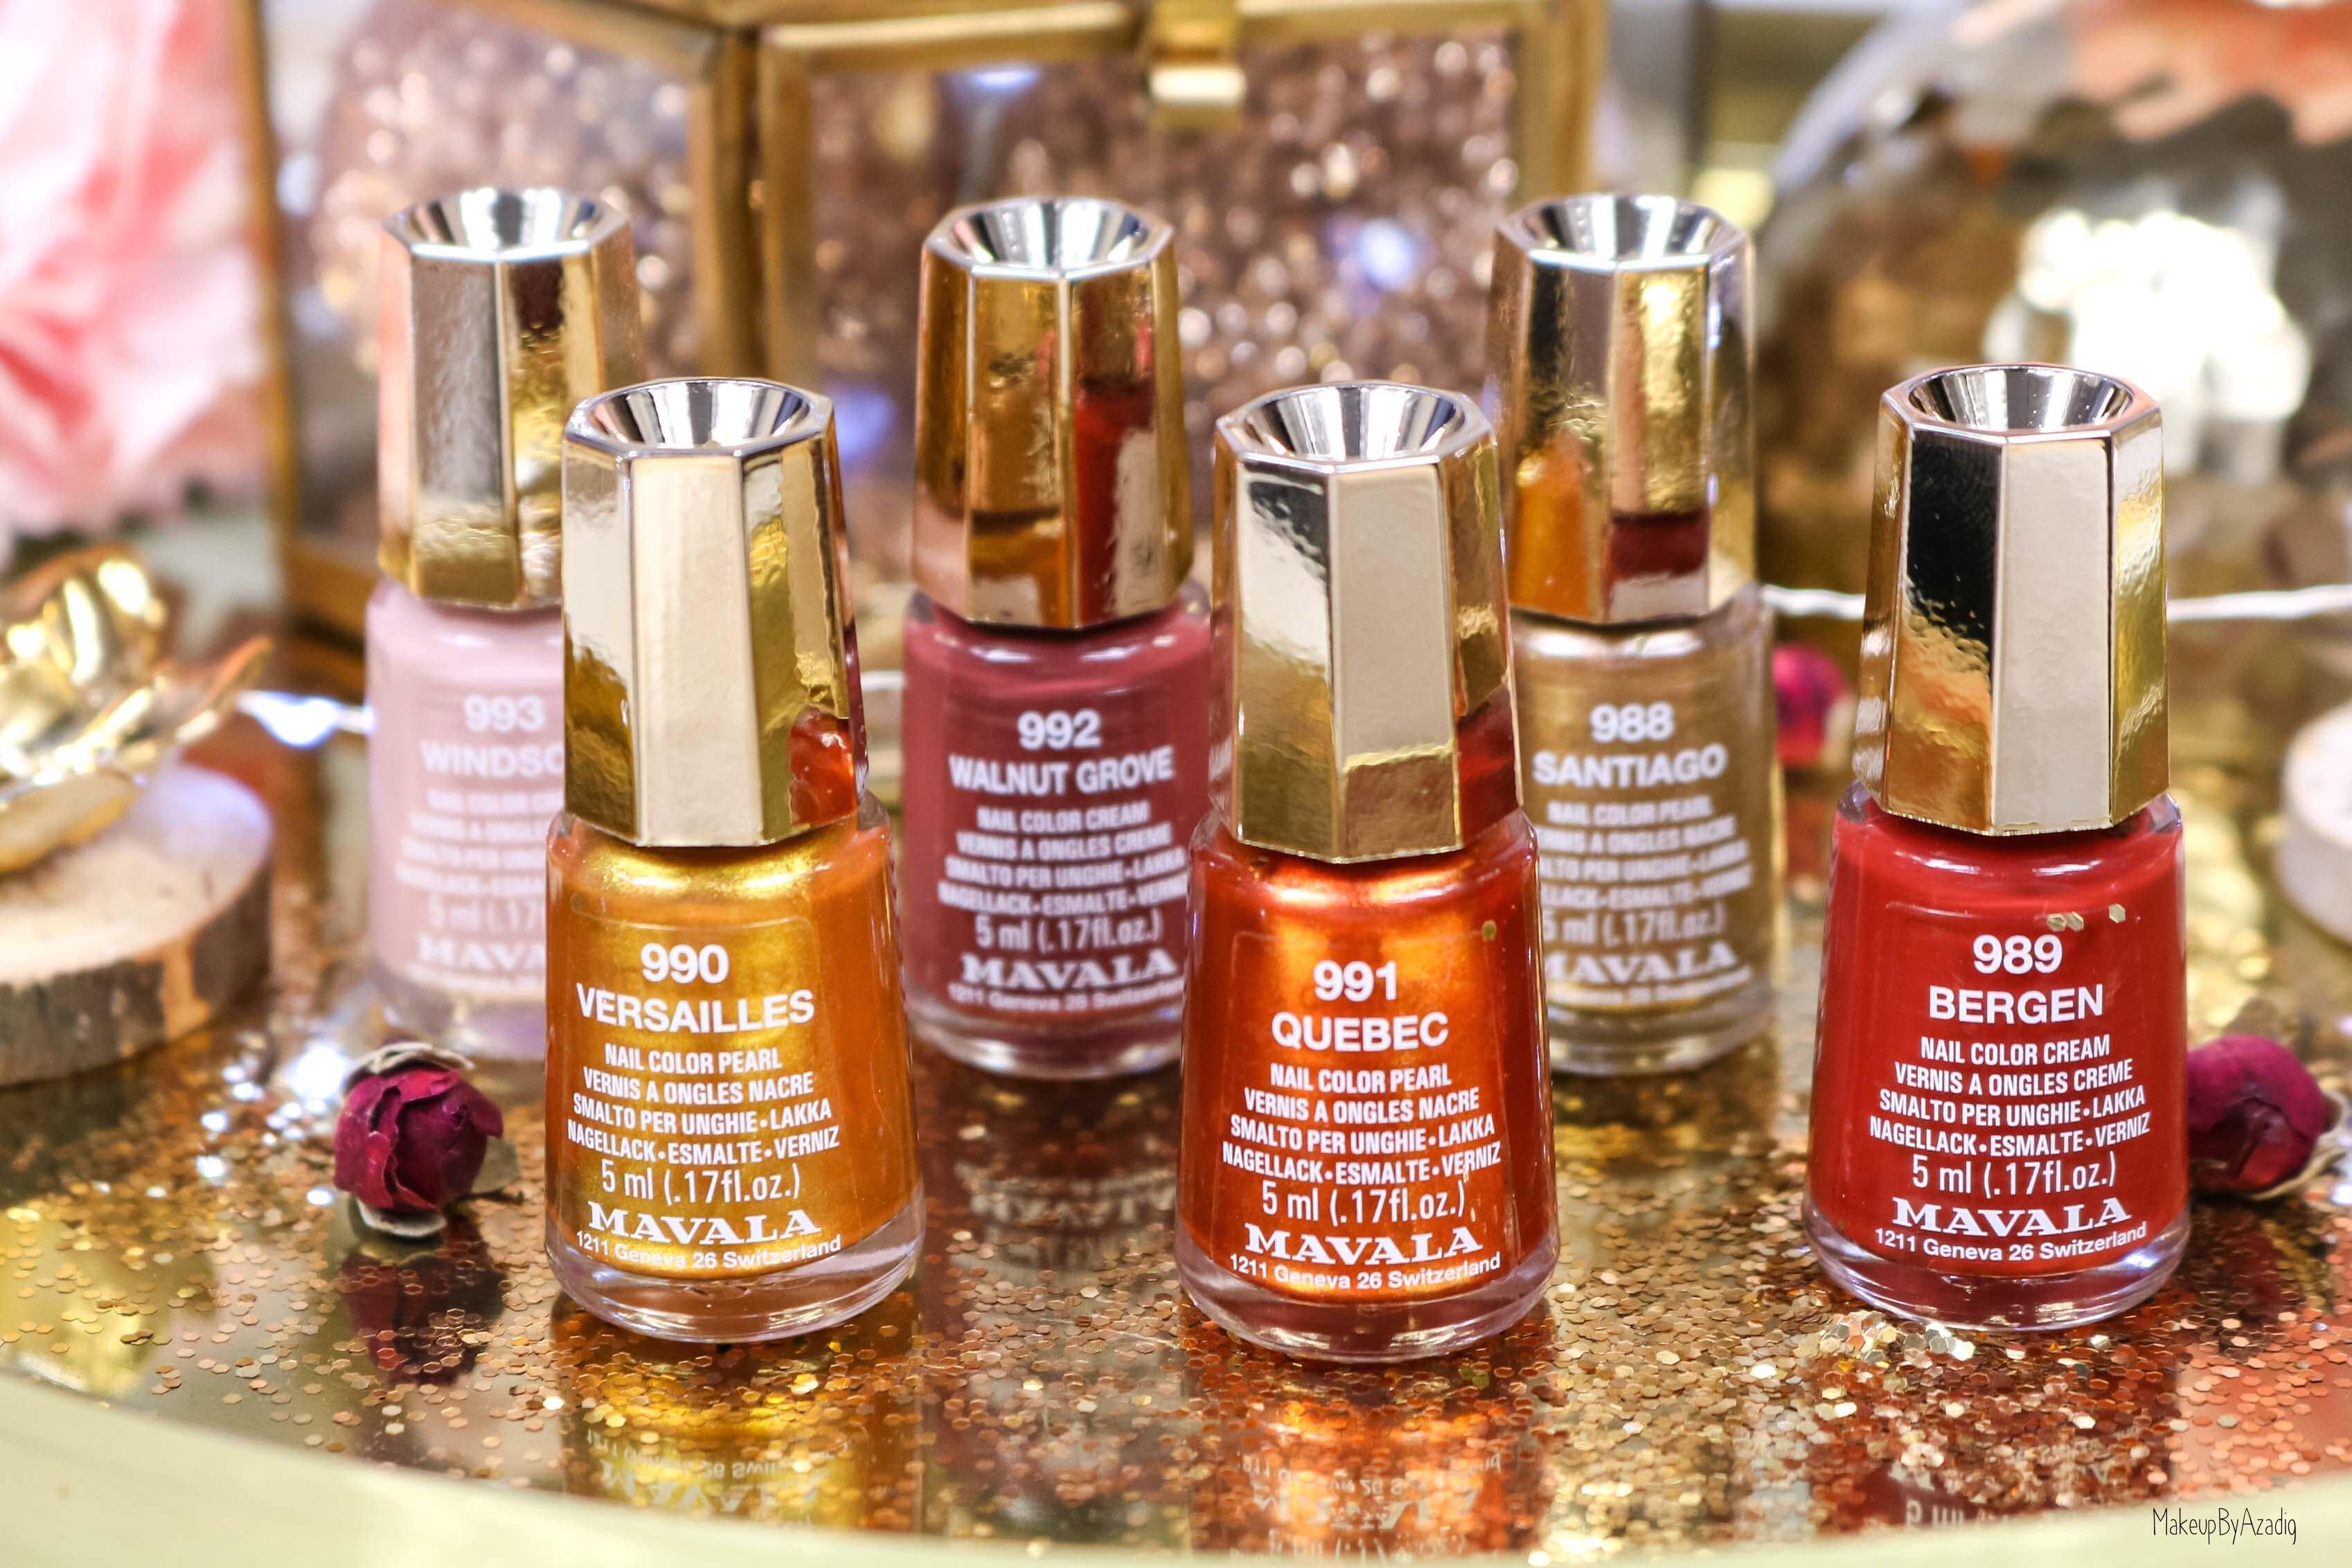 revue-collection-vernis-mavala-nails-heritage-chic-bordeaux-cuivre-metallique-gold-rouge-makeupbyazadig-swatch-avis-prix-mavala